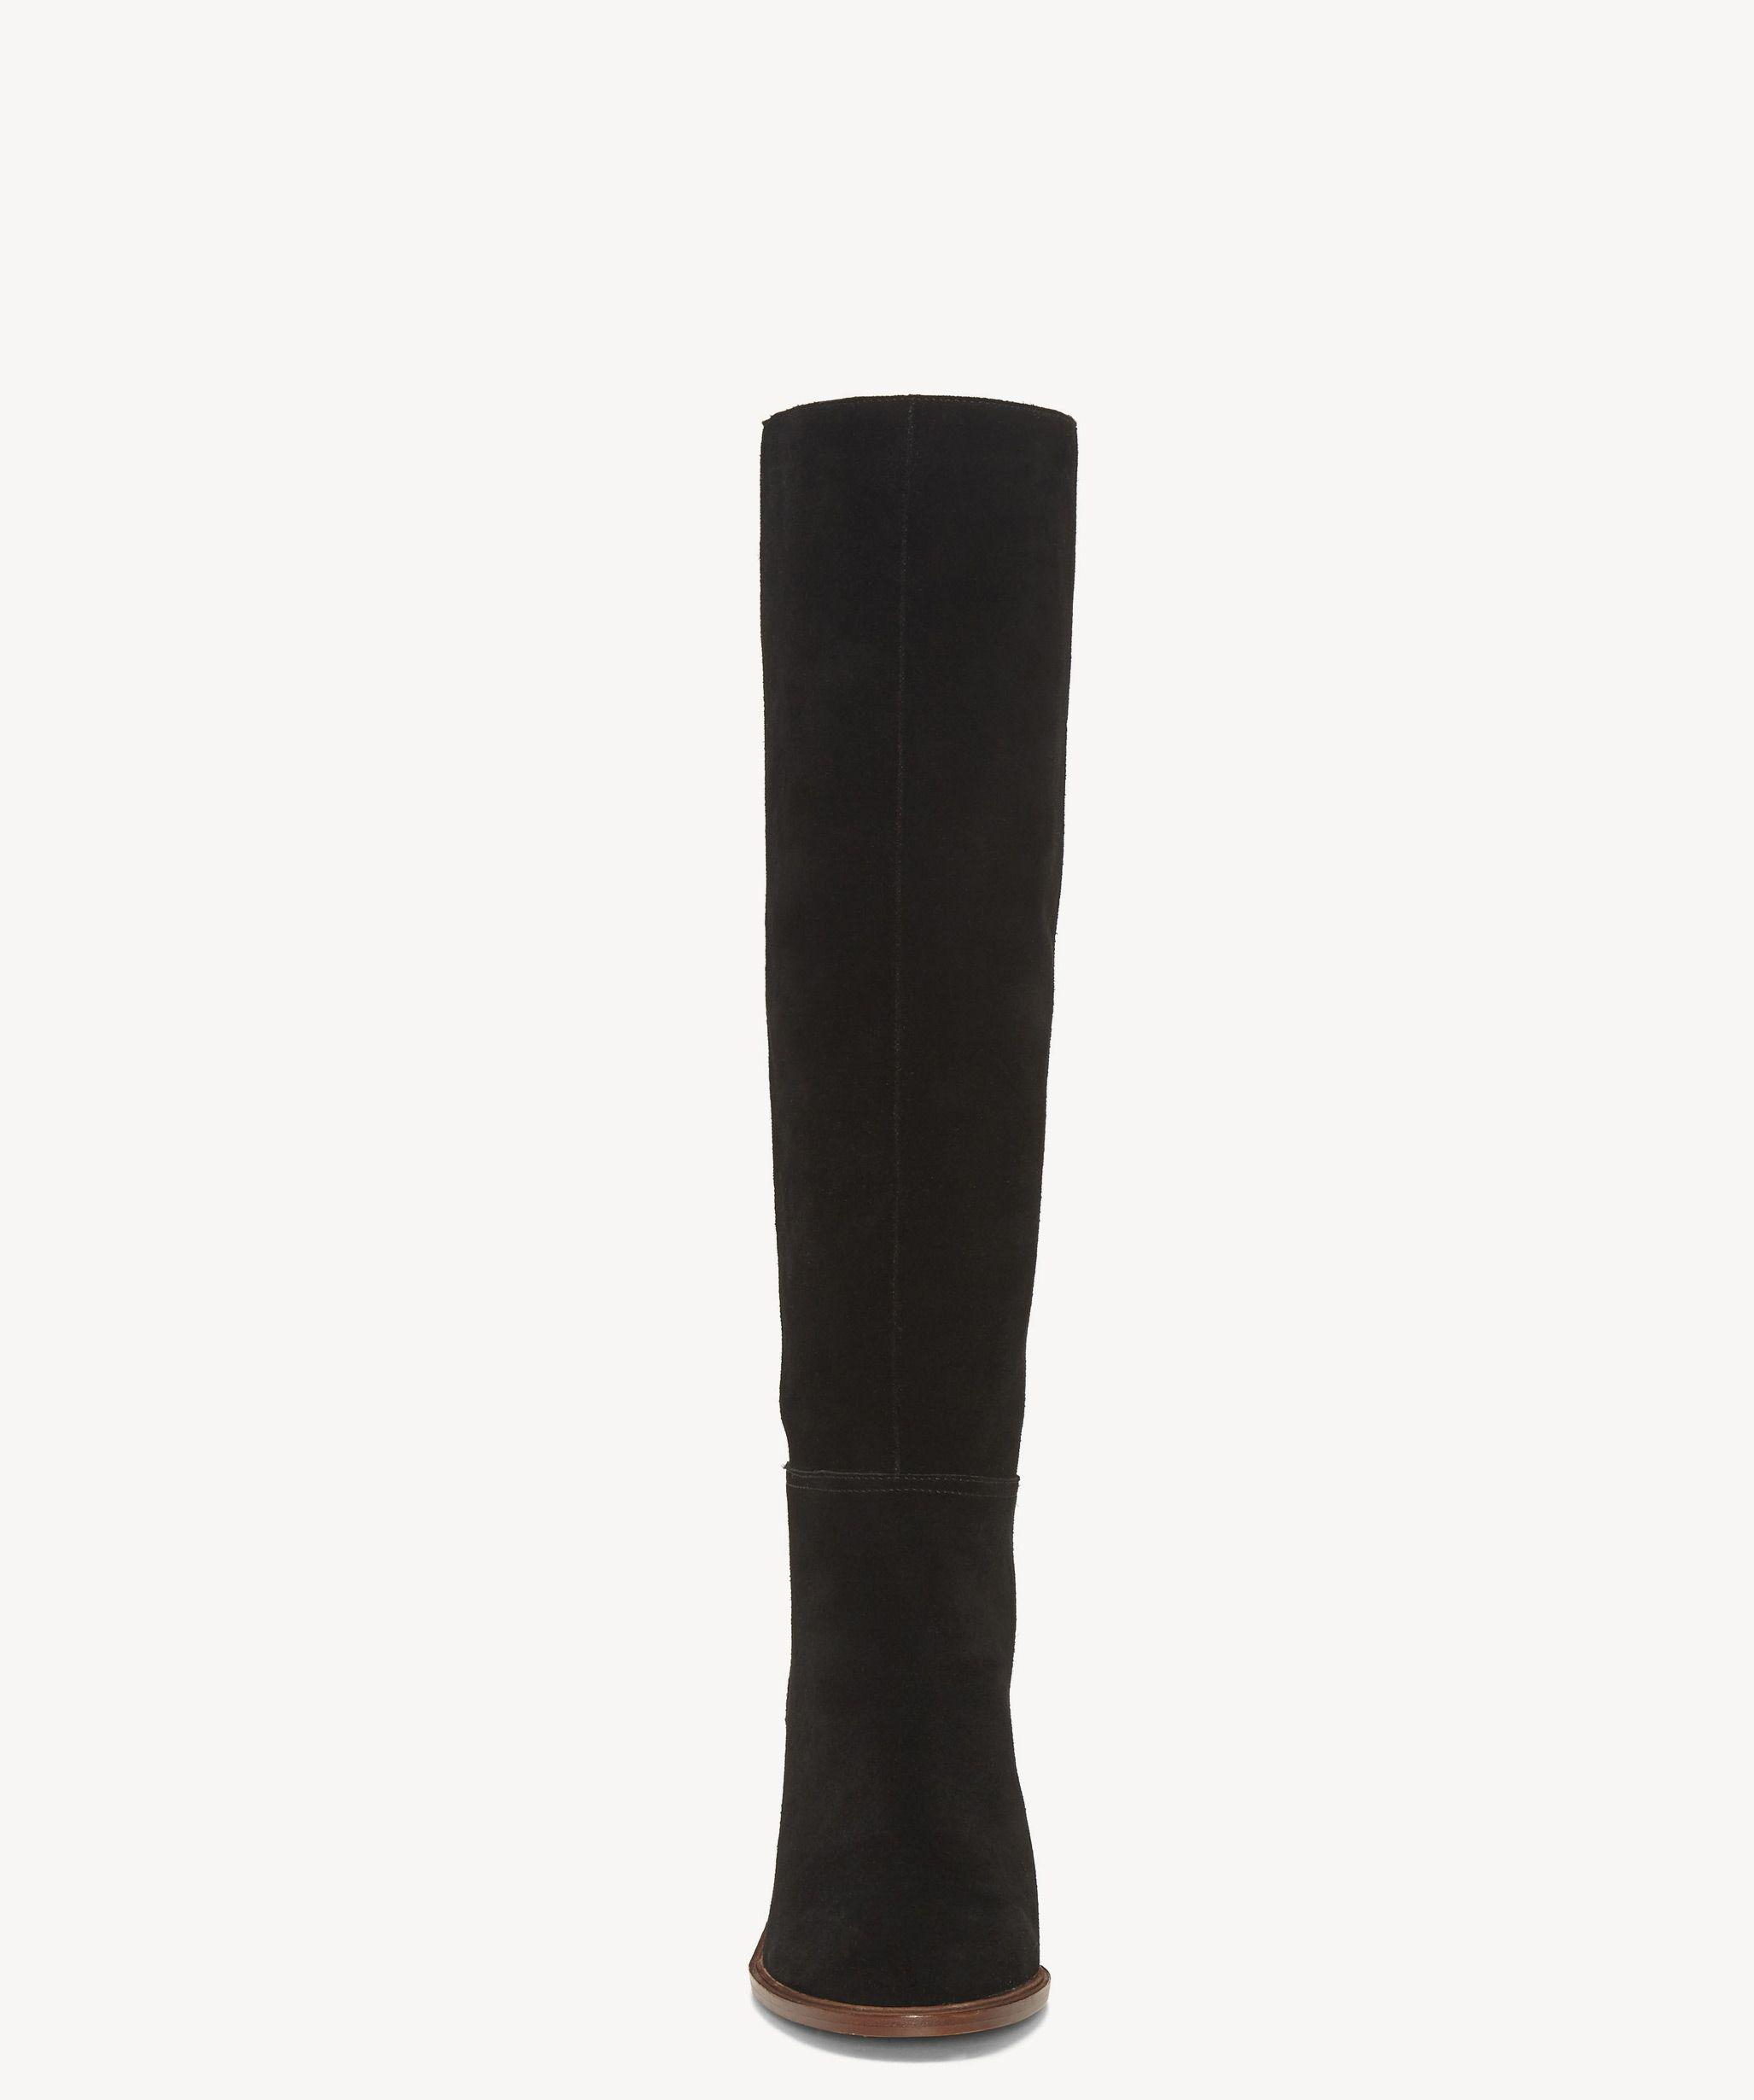 Vince-Camuto-DAMEERA-Knee-High-Block-Heel-Fashion-Dress-Boots thumbnail 3